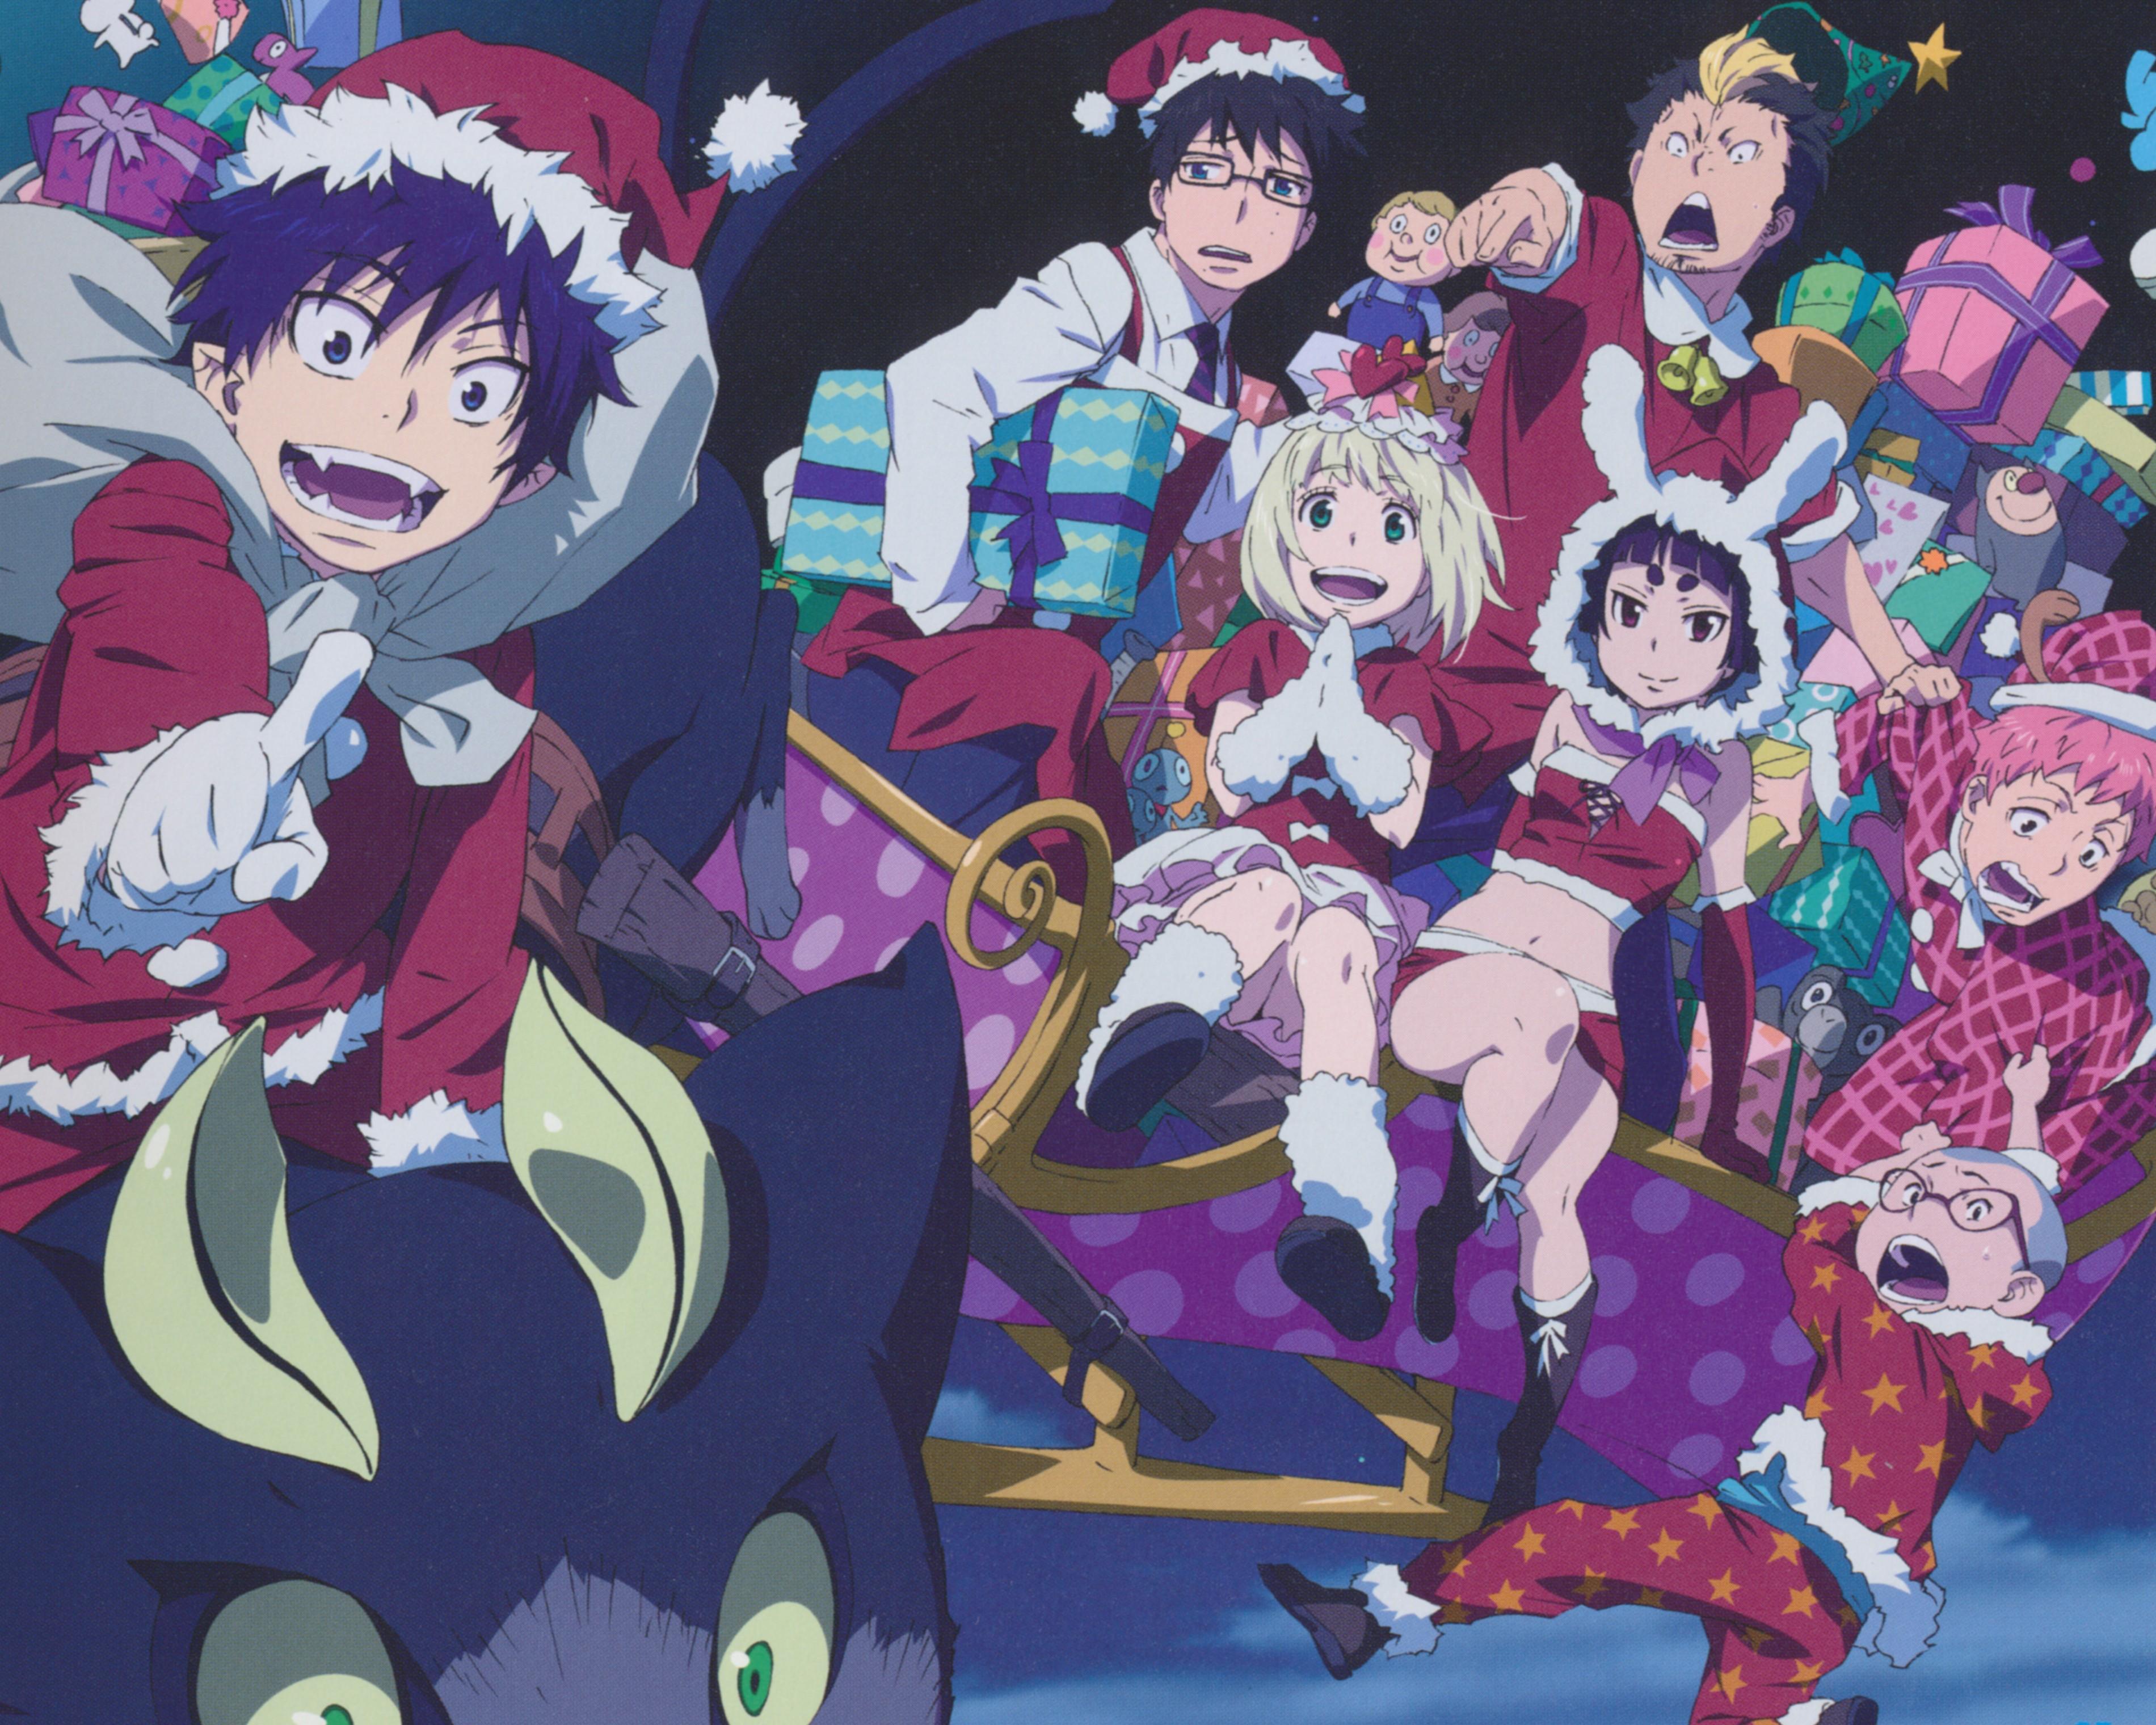 Big Anime Christmas Wallpaper No 1 Wallpaper Hd